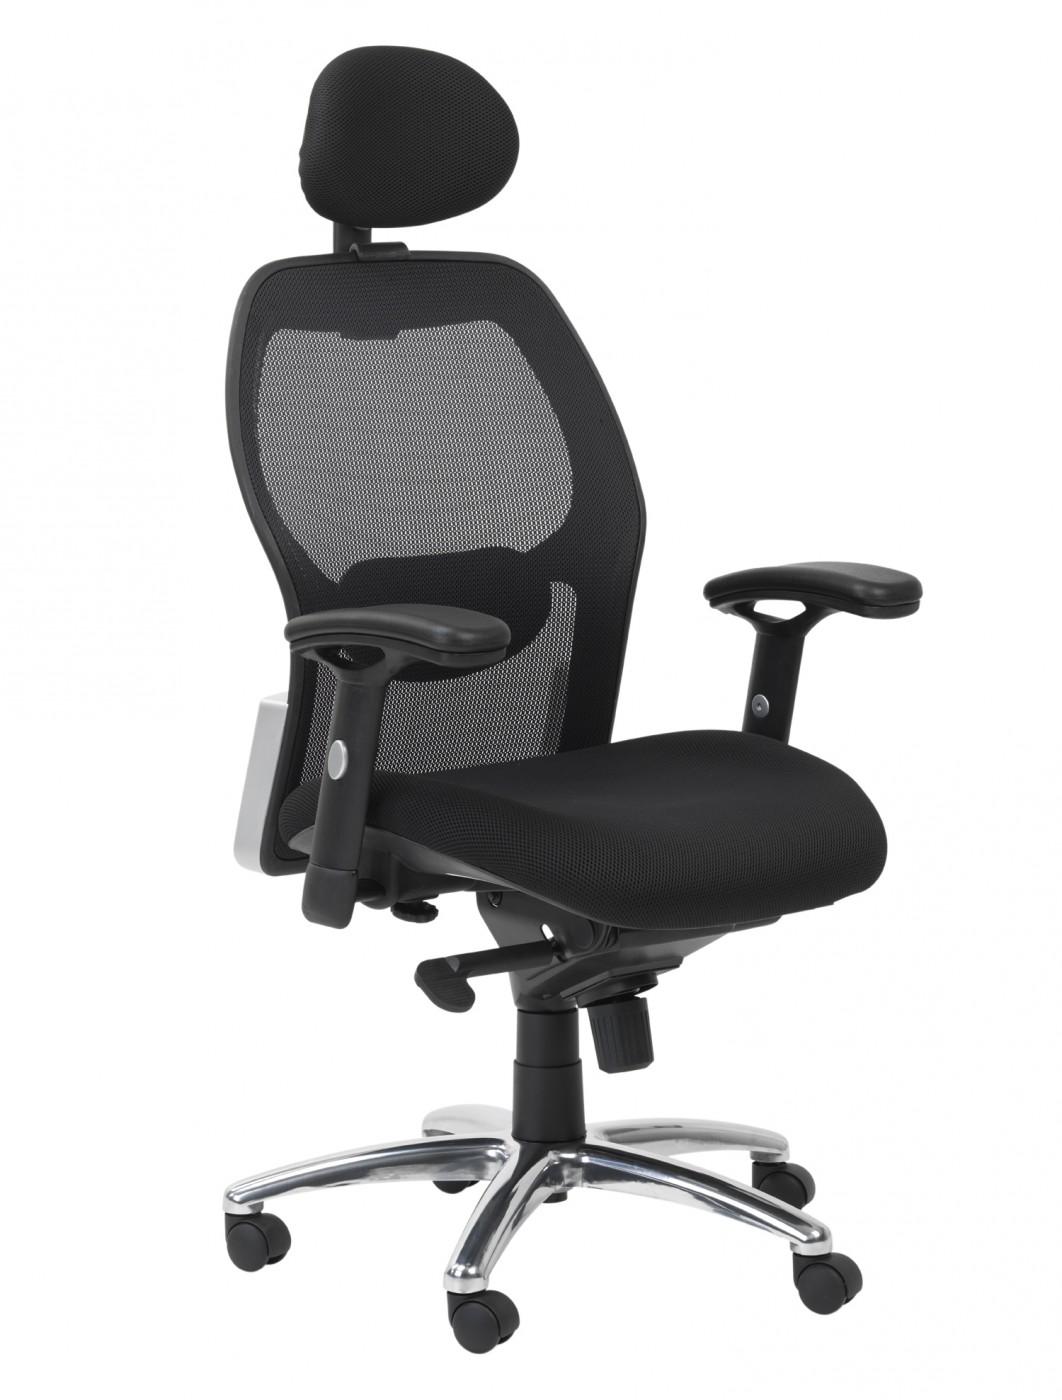 alphason portland executive chair aoc7301 m 121 office. Black Bedroom Furniture Sets. Home Design Ideas